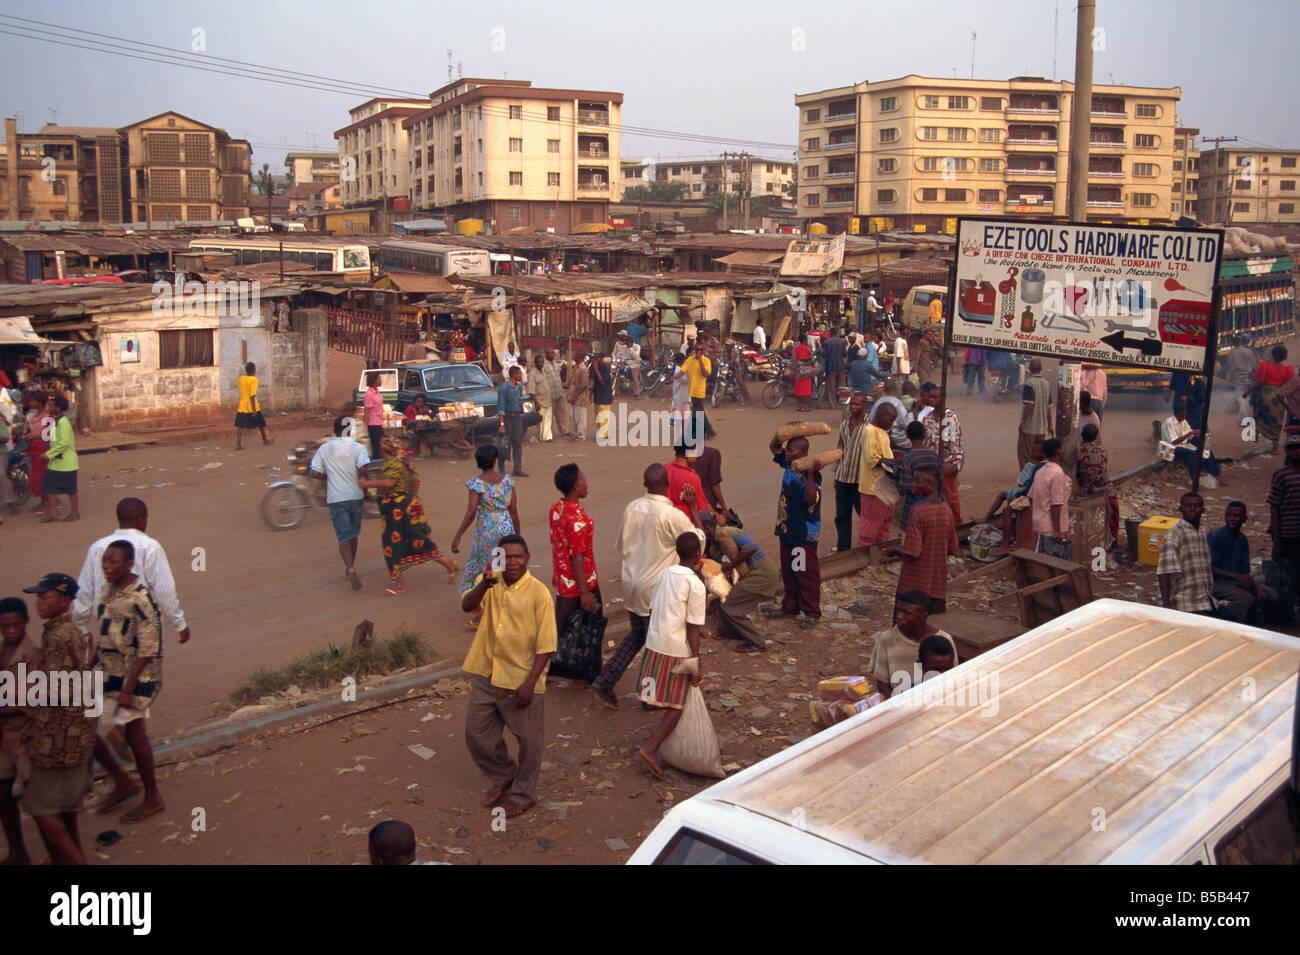 Street scene Onitsha Nigeria West Africa Africa Stock Photo - Alamy